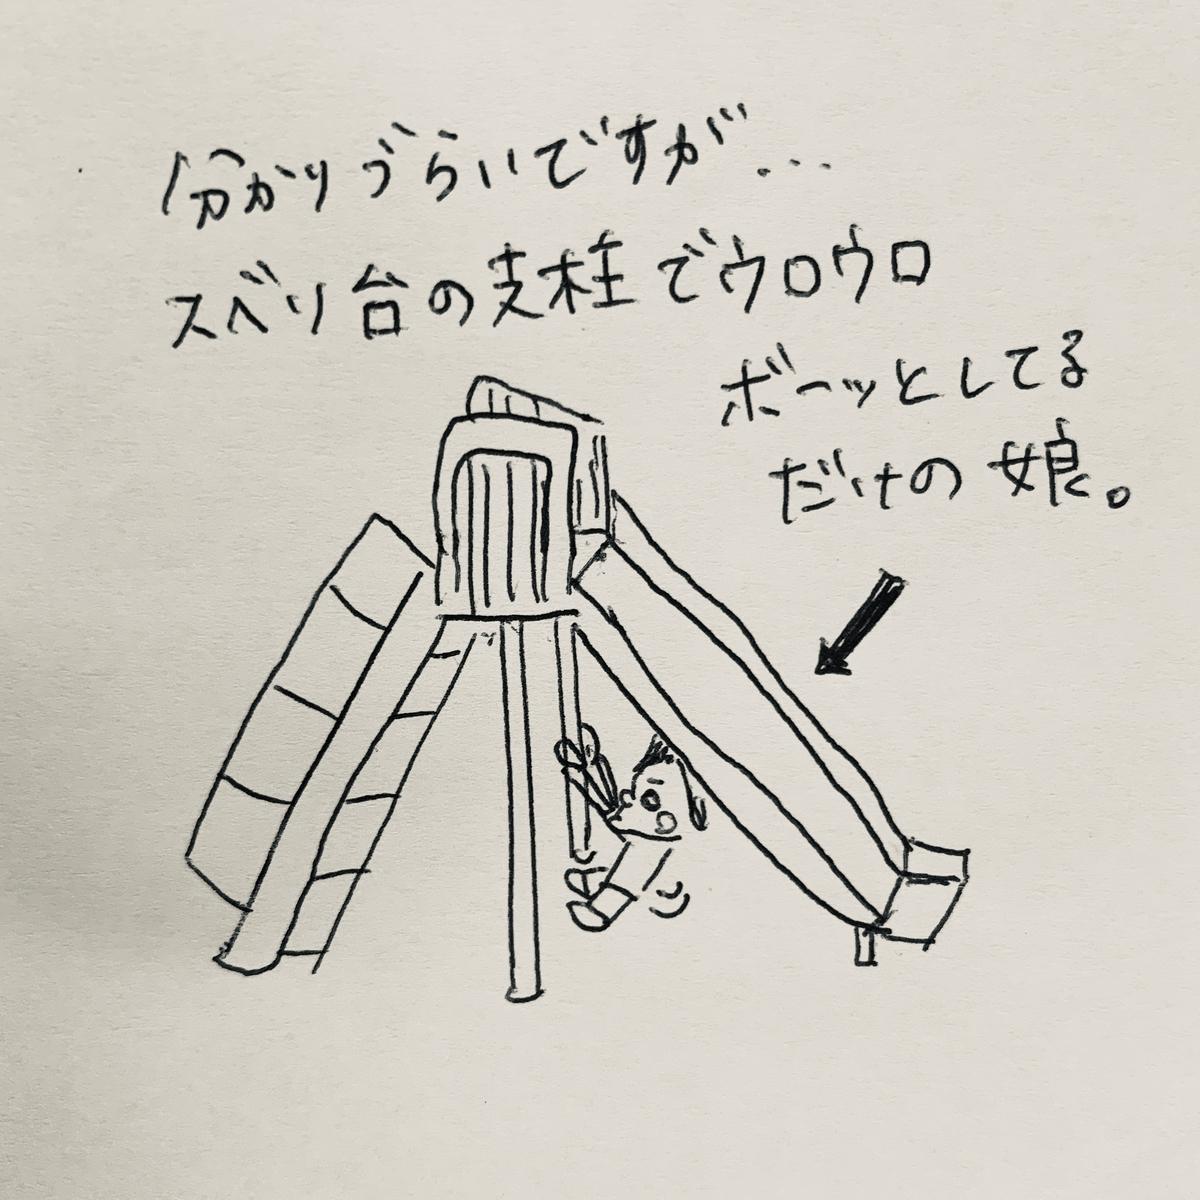 f:id:nananan0:20190621160339j:plain